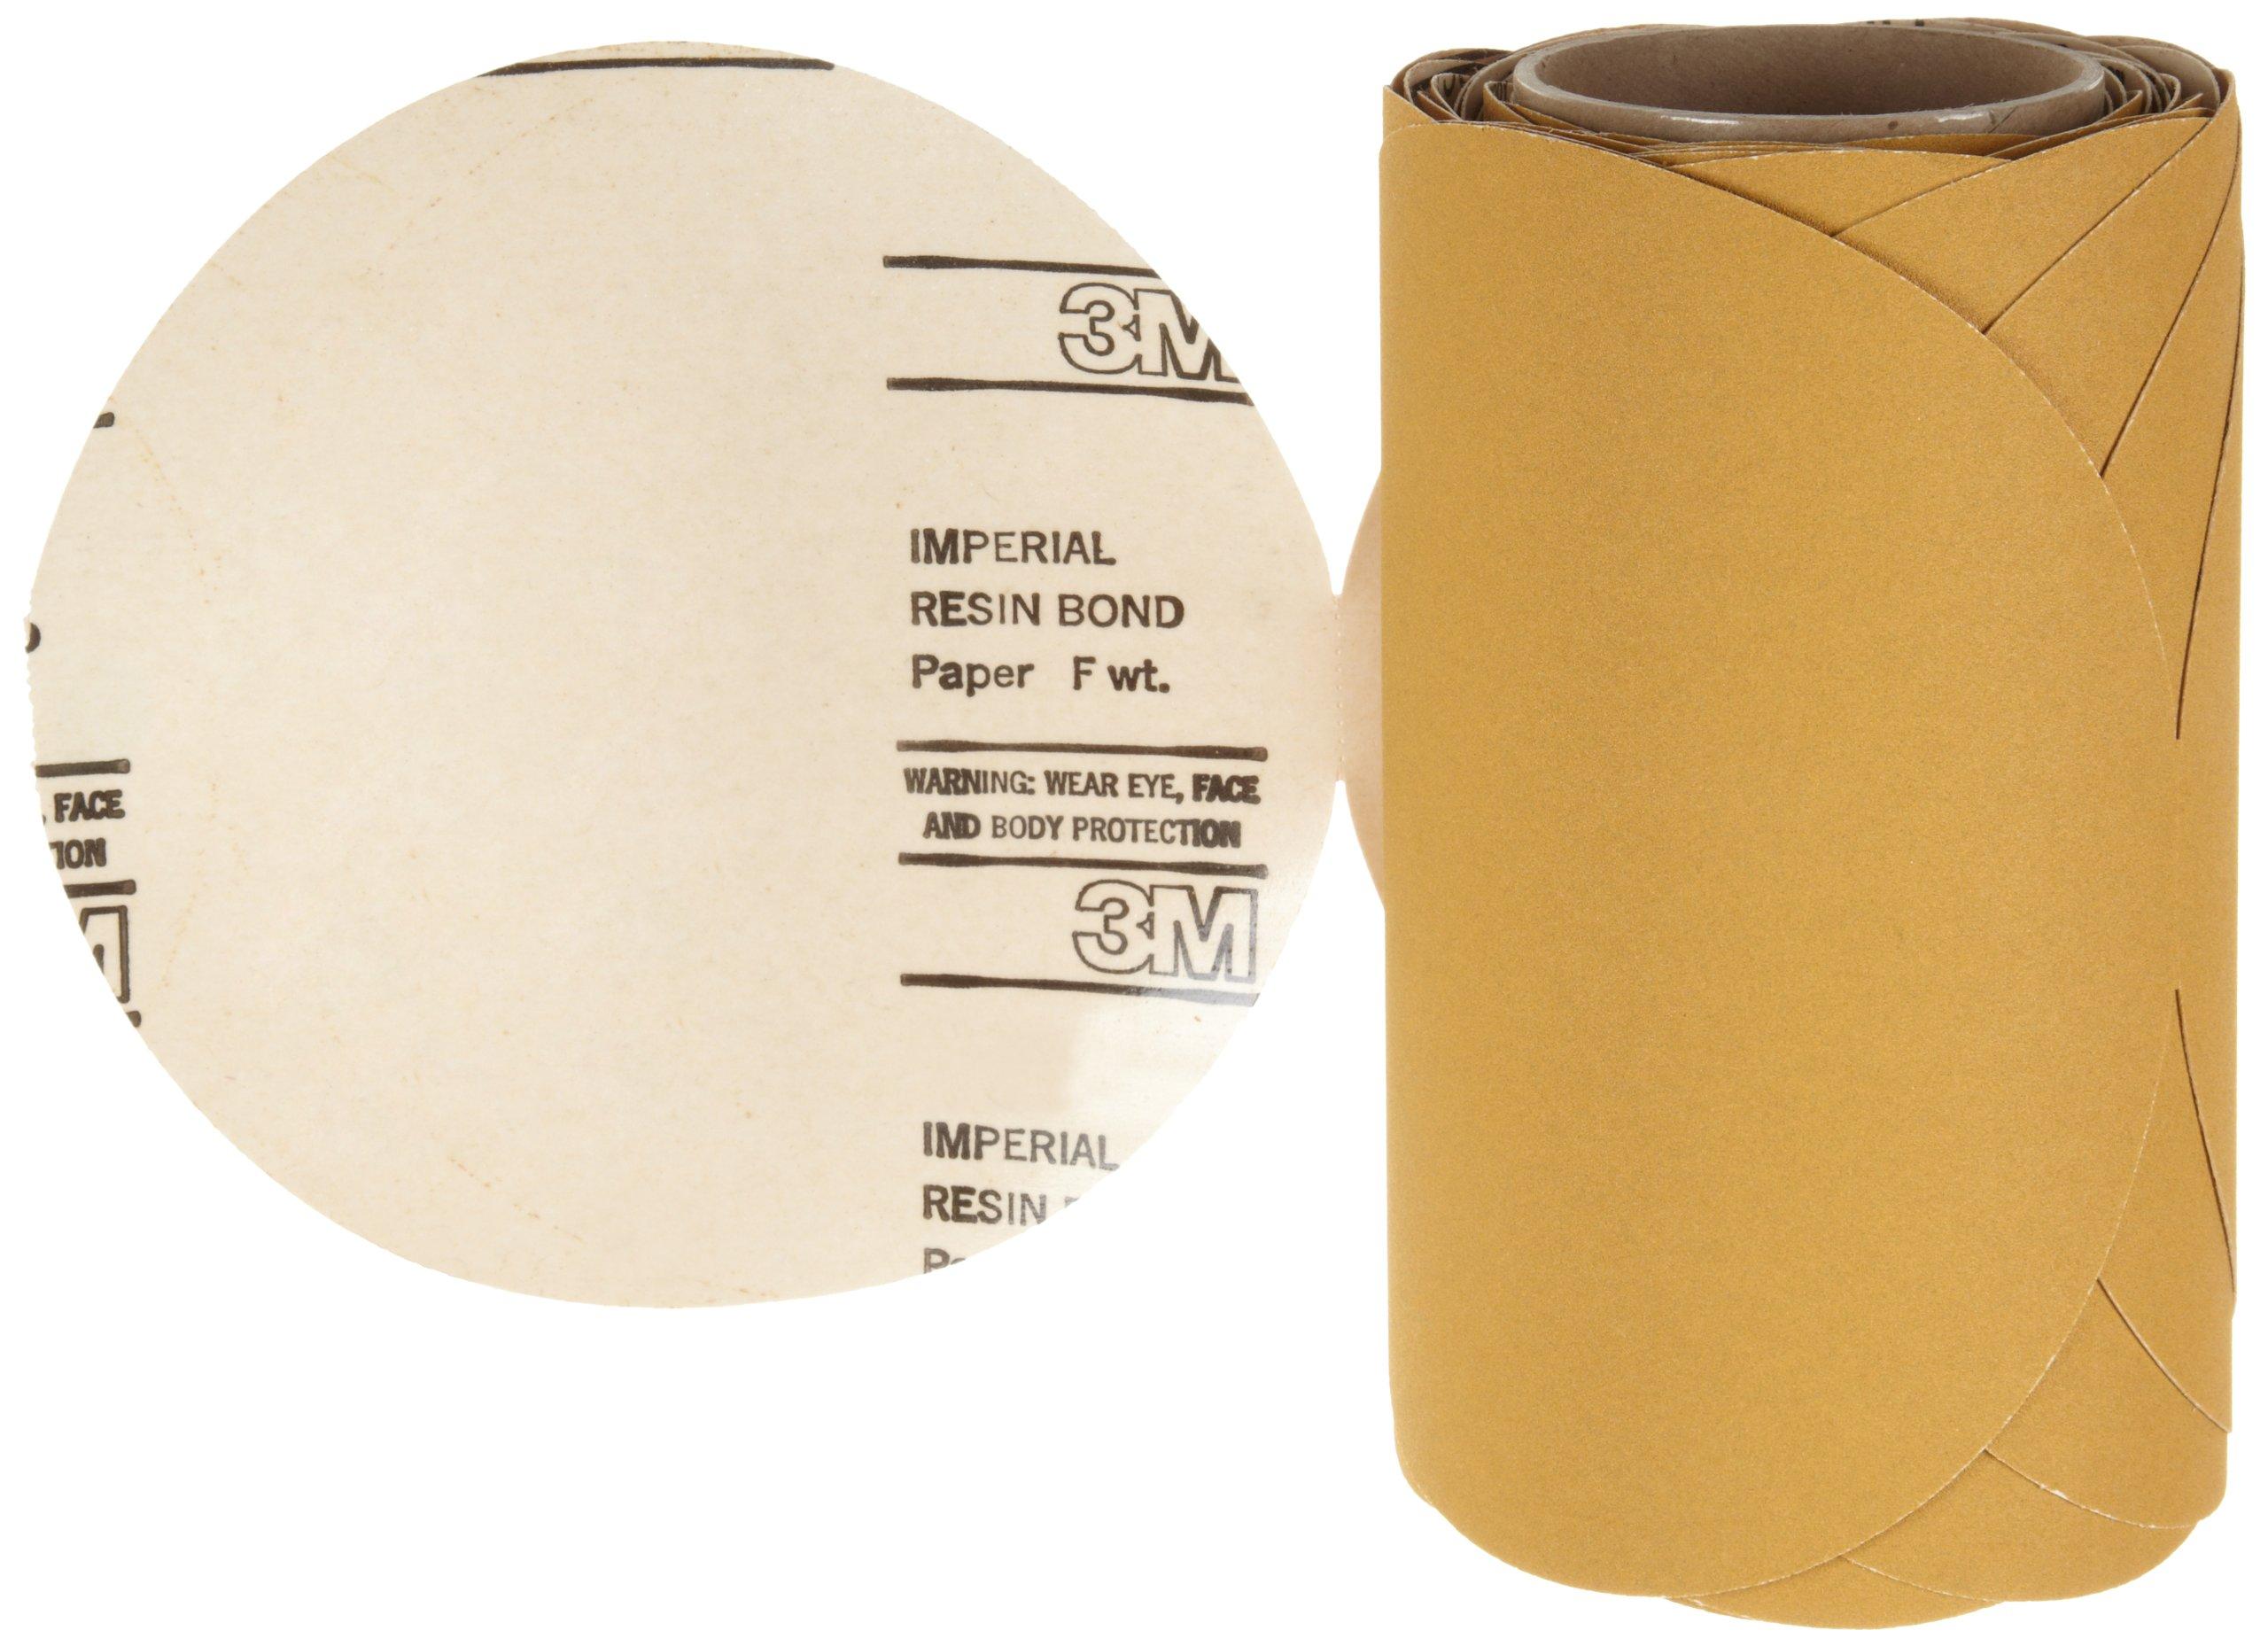 3M Stikit Paper Disc Roll 363I, PSA Attachment, Aluminum Oxide, 8'' Diameter, P150 Grit (Roll of 50) by Cubitron (Image #1)